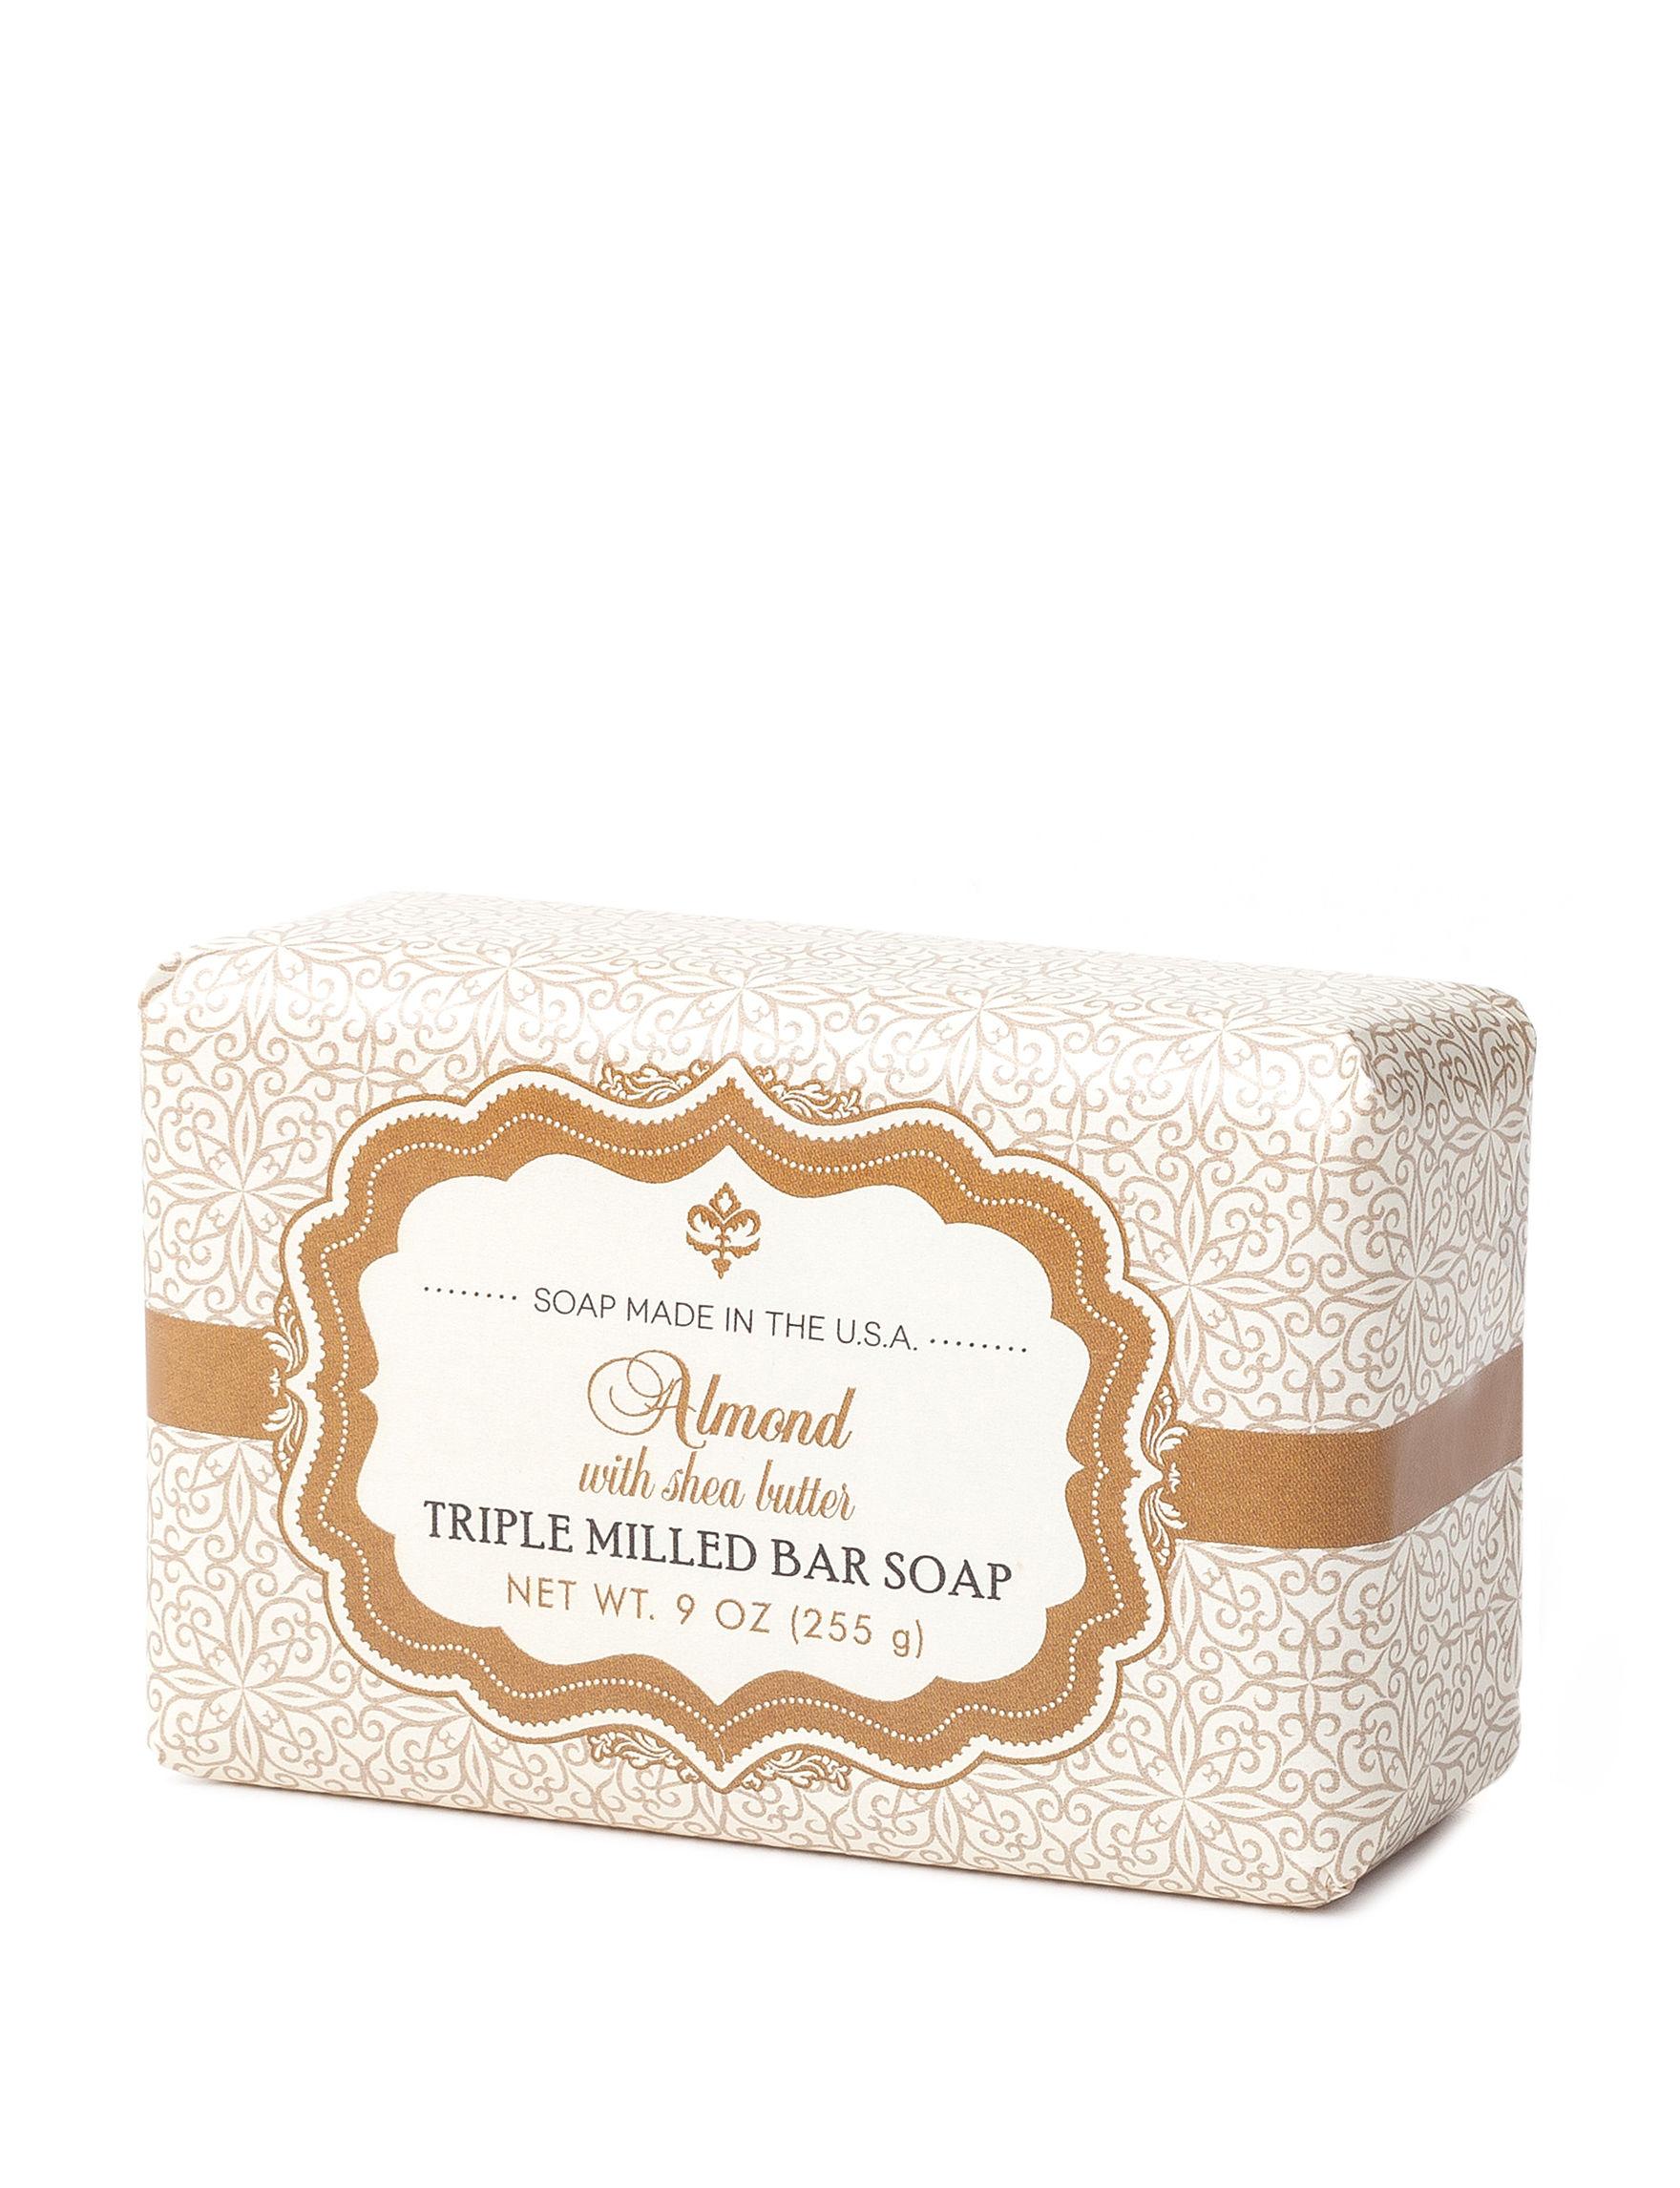 Common Wealth Soaps Almond Soaps